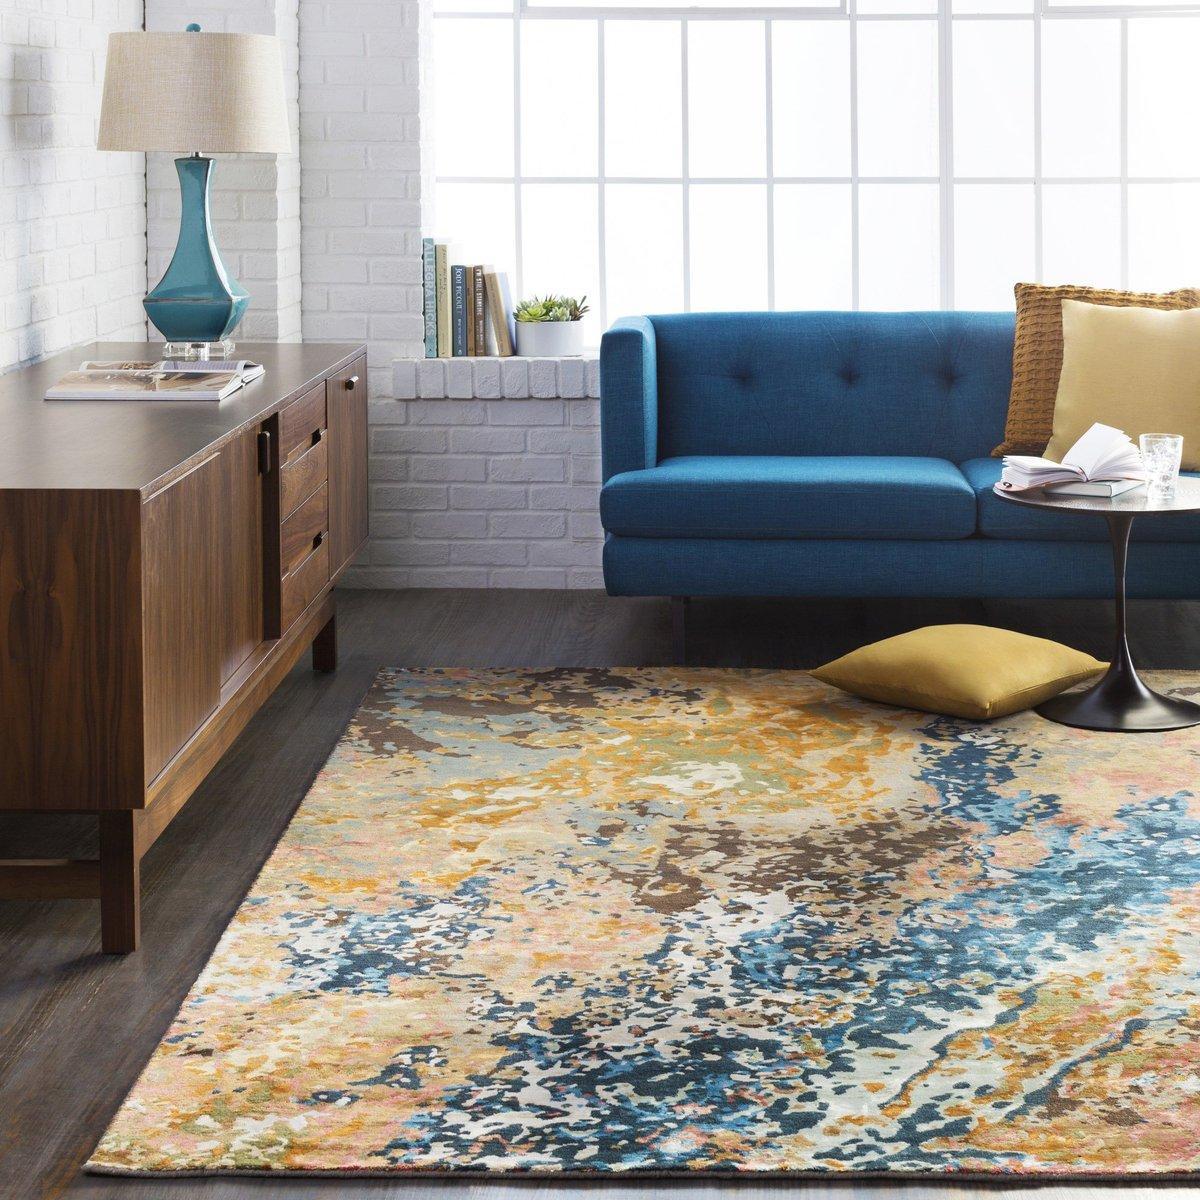 Color Coordination Living Room Decor Ideas